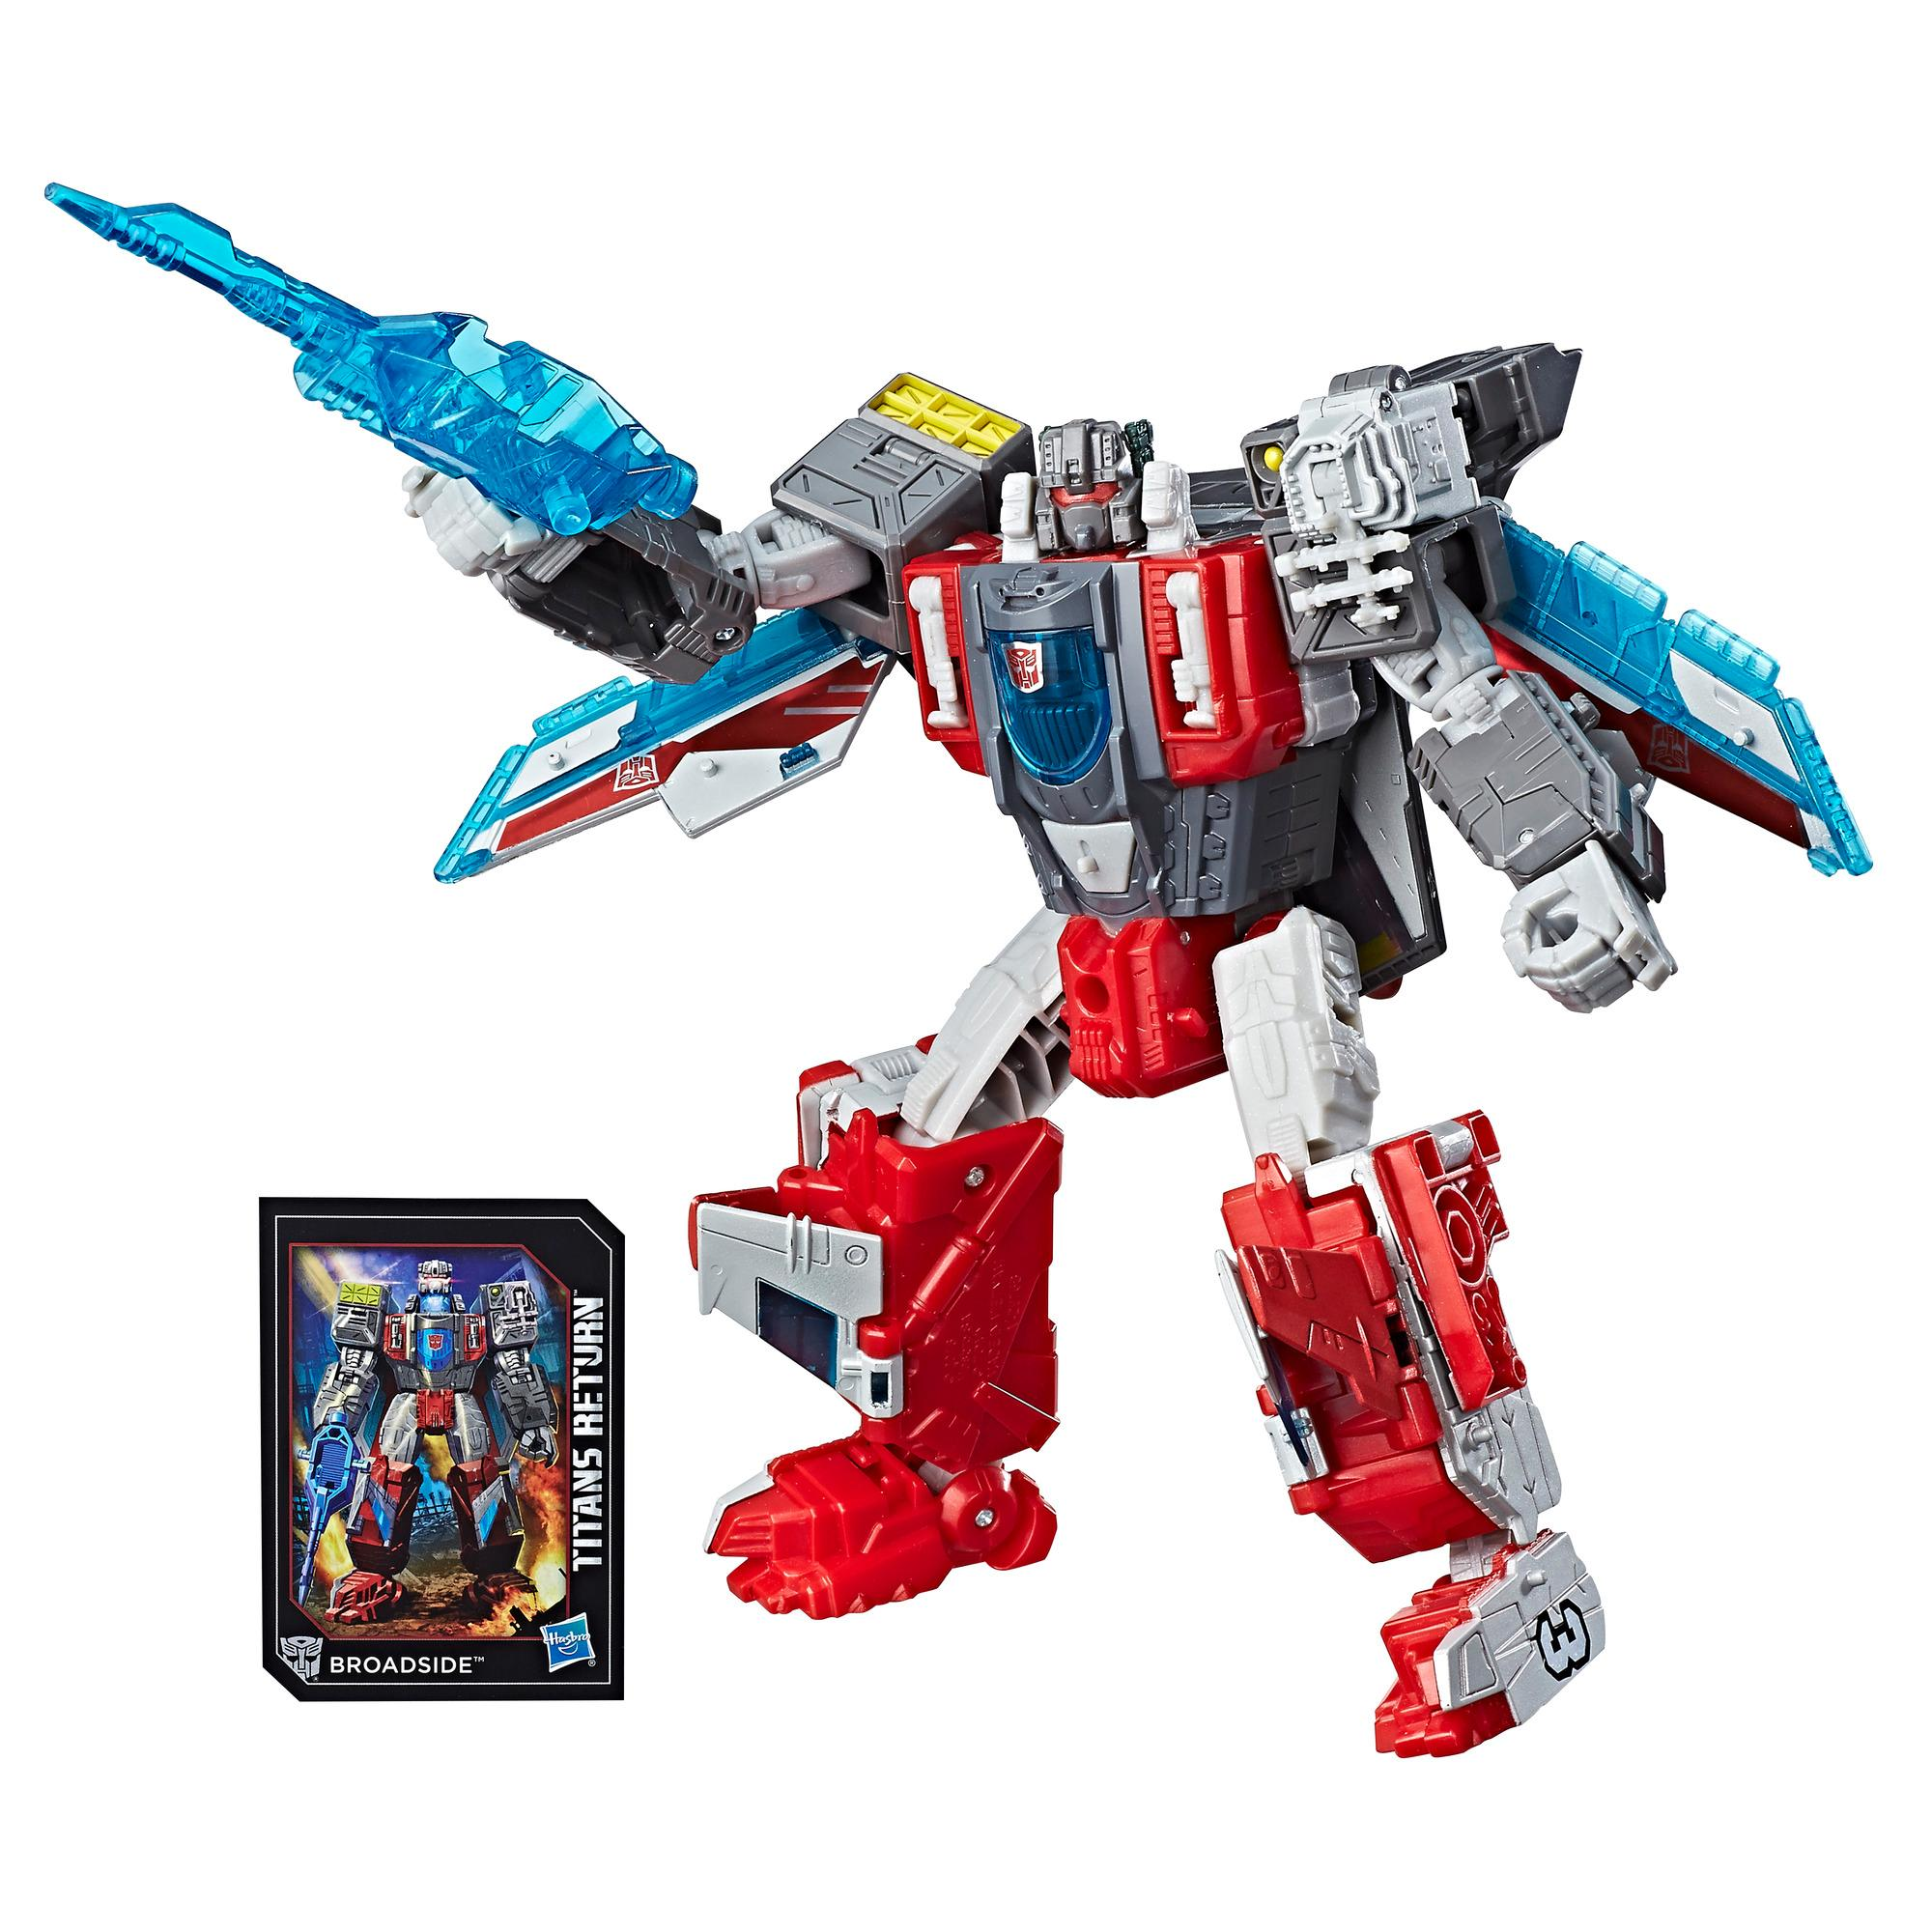 Transformers Generations Titans Return Broadside and Blunderbuss